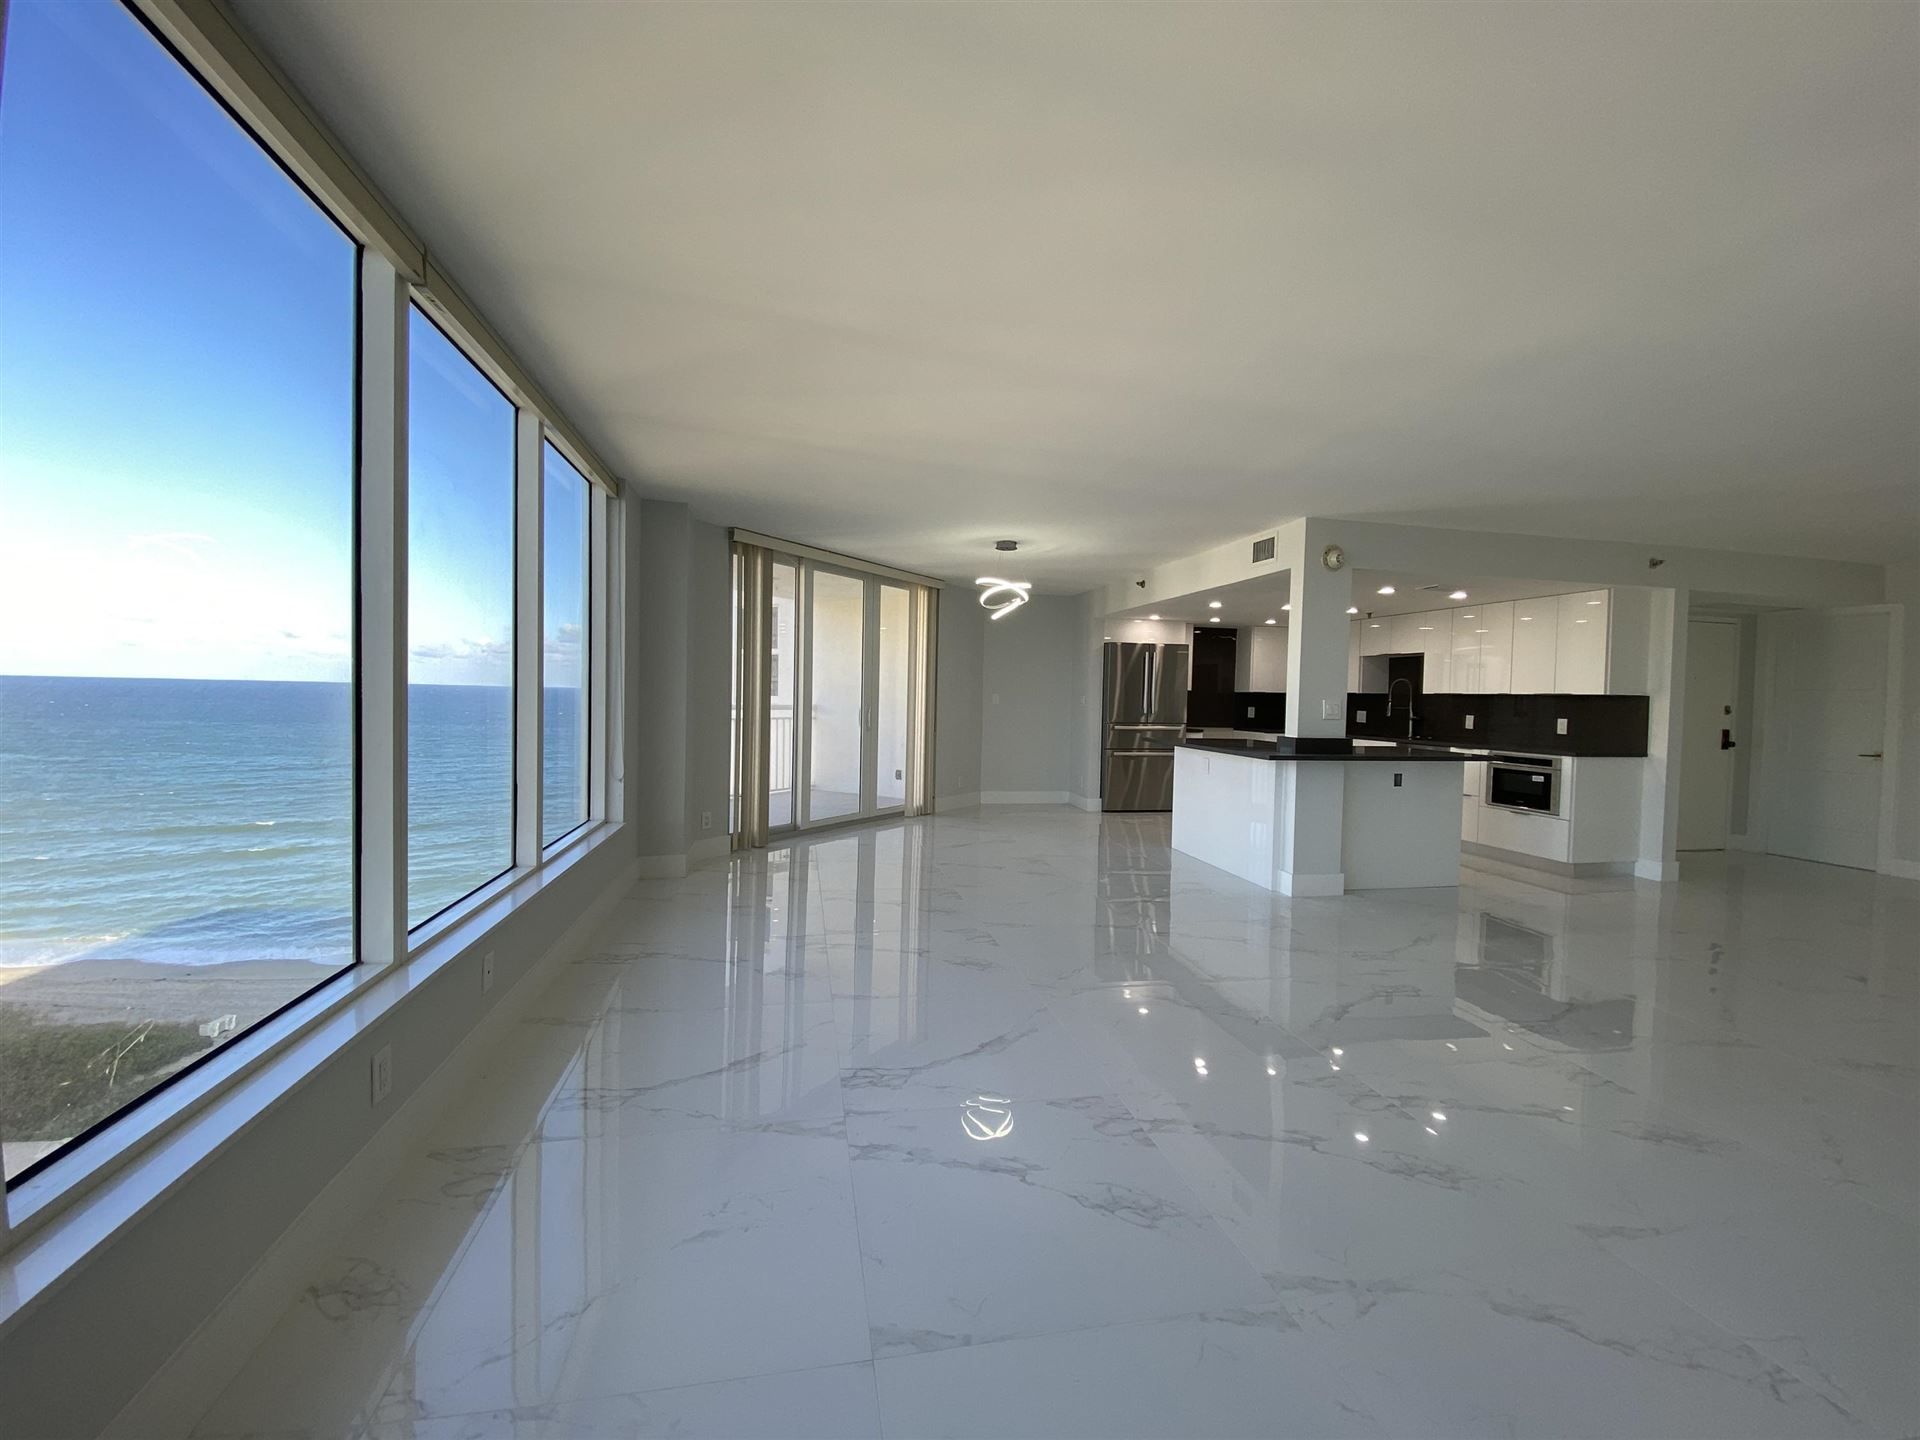 3015 S Ocean Boulevard #703 A.K.A. 7c, Highland Beach, FL 33487 - #: RX-10674739